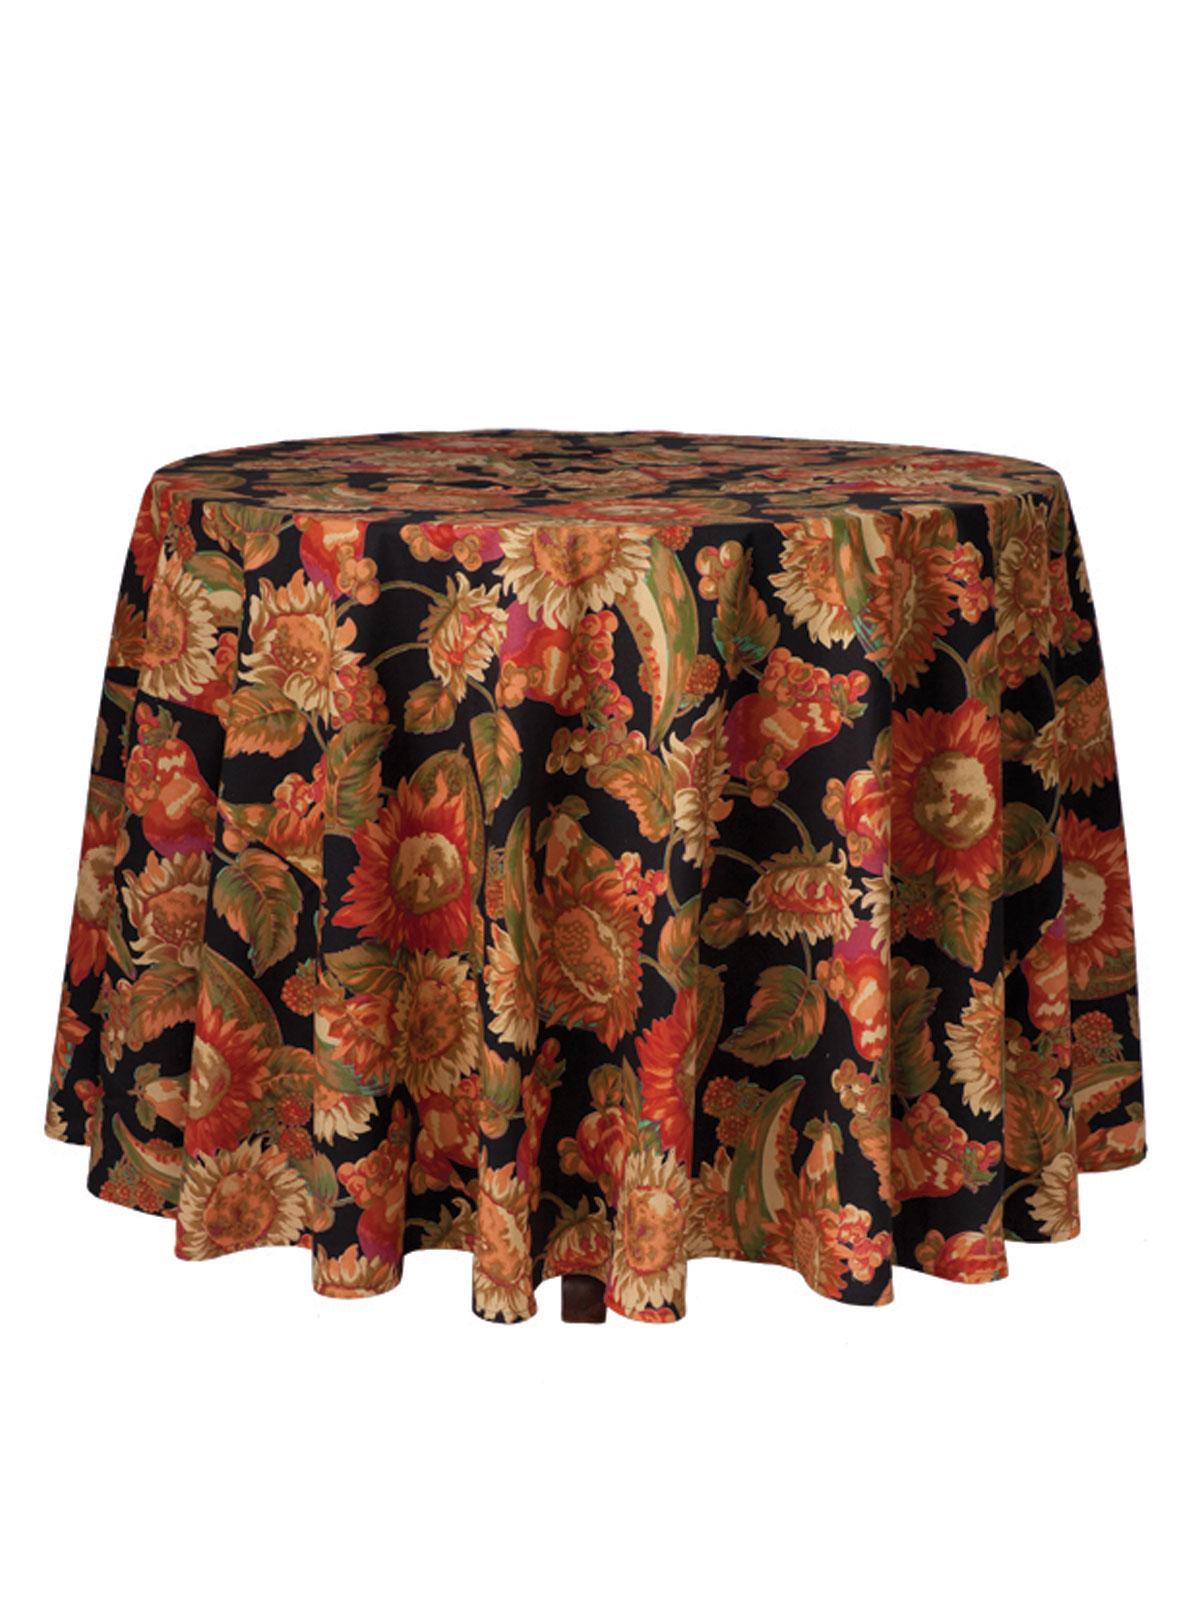 Sunflower Round Tablecloth - Black